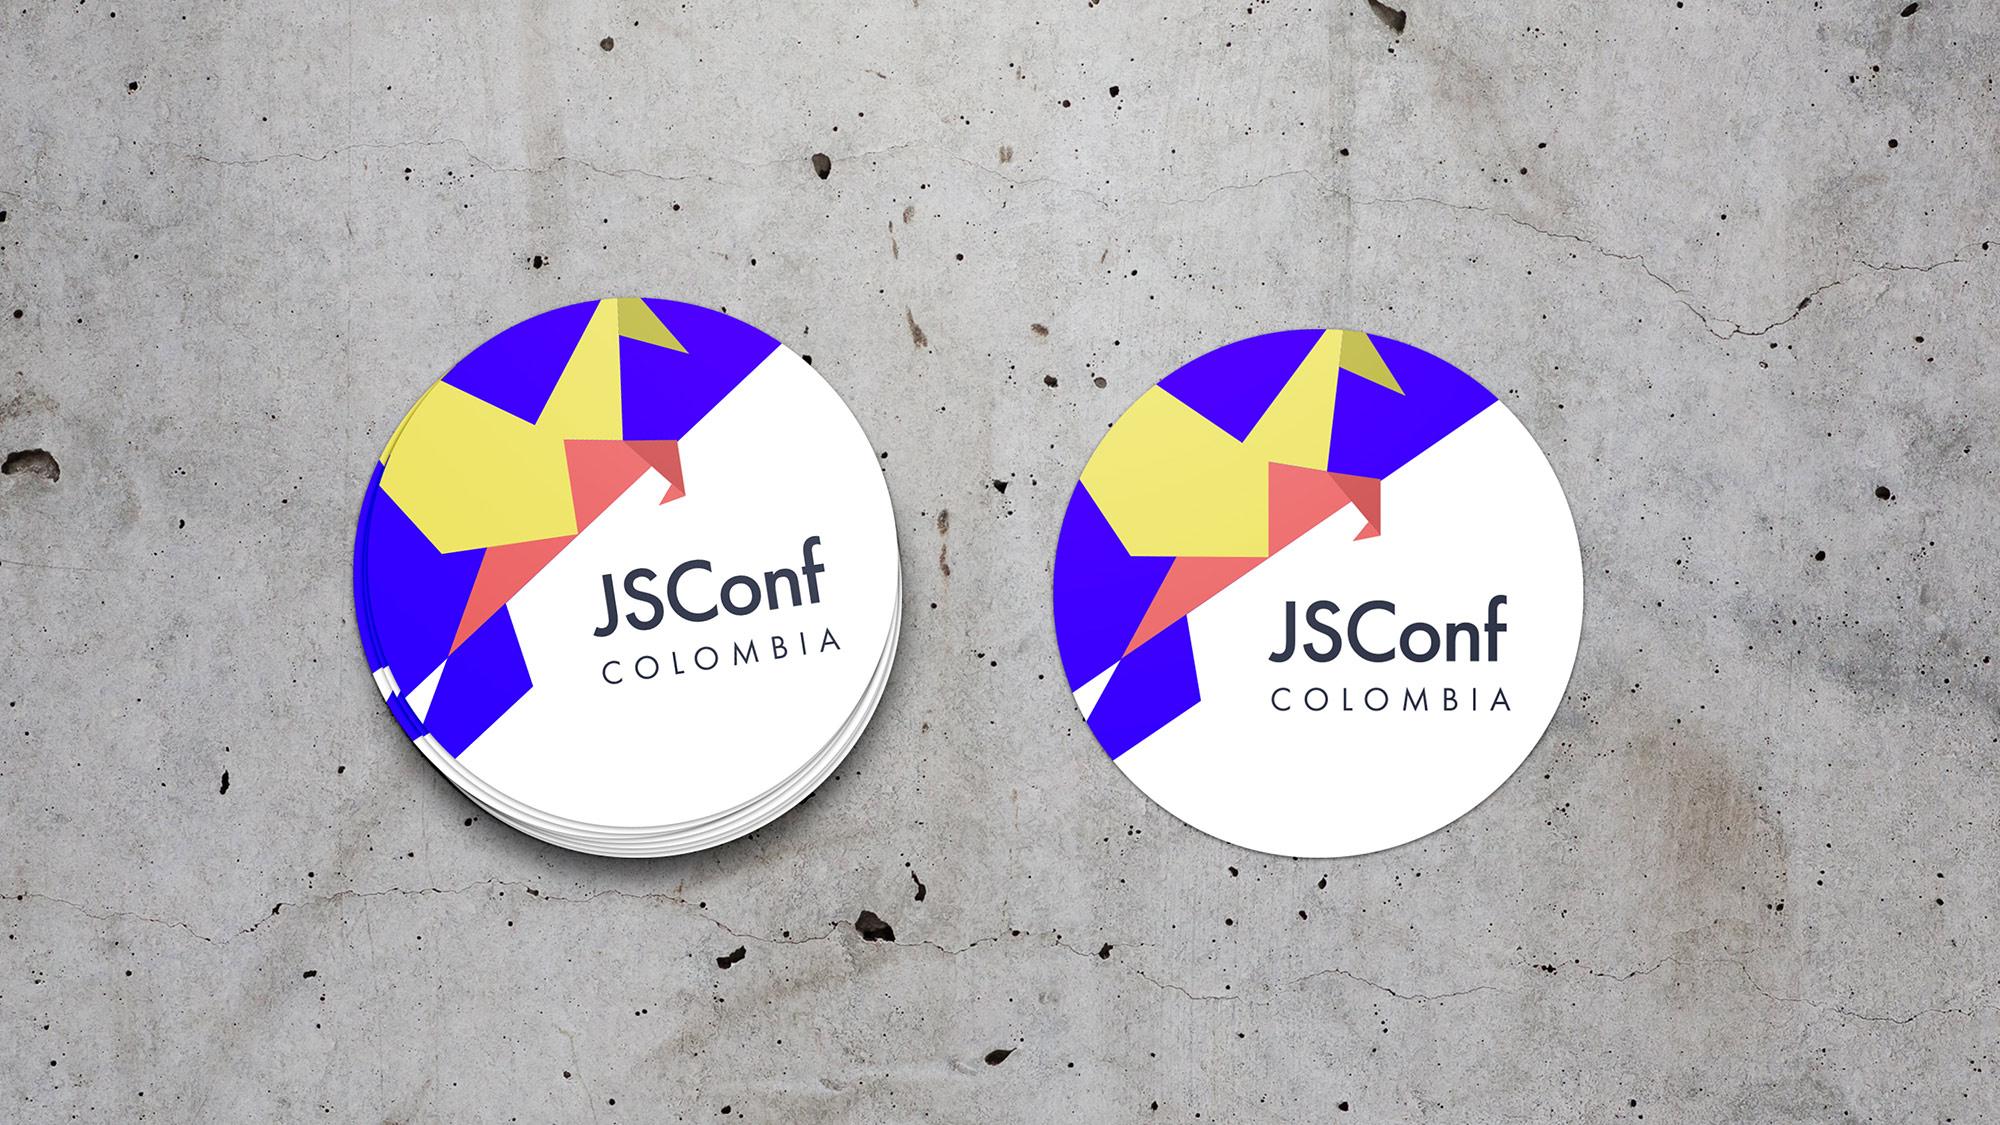 JSConf_IDArtboard-1-copy-11.jpg